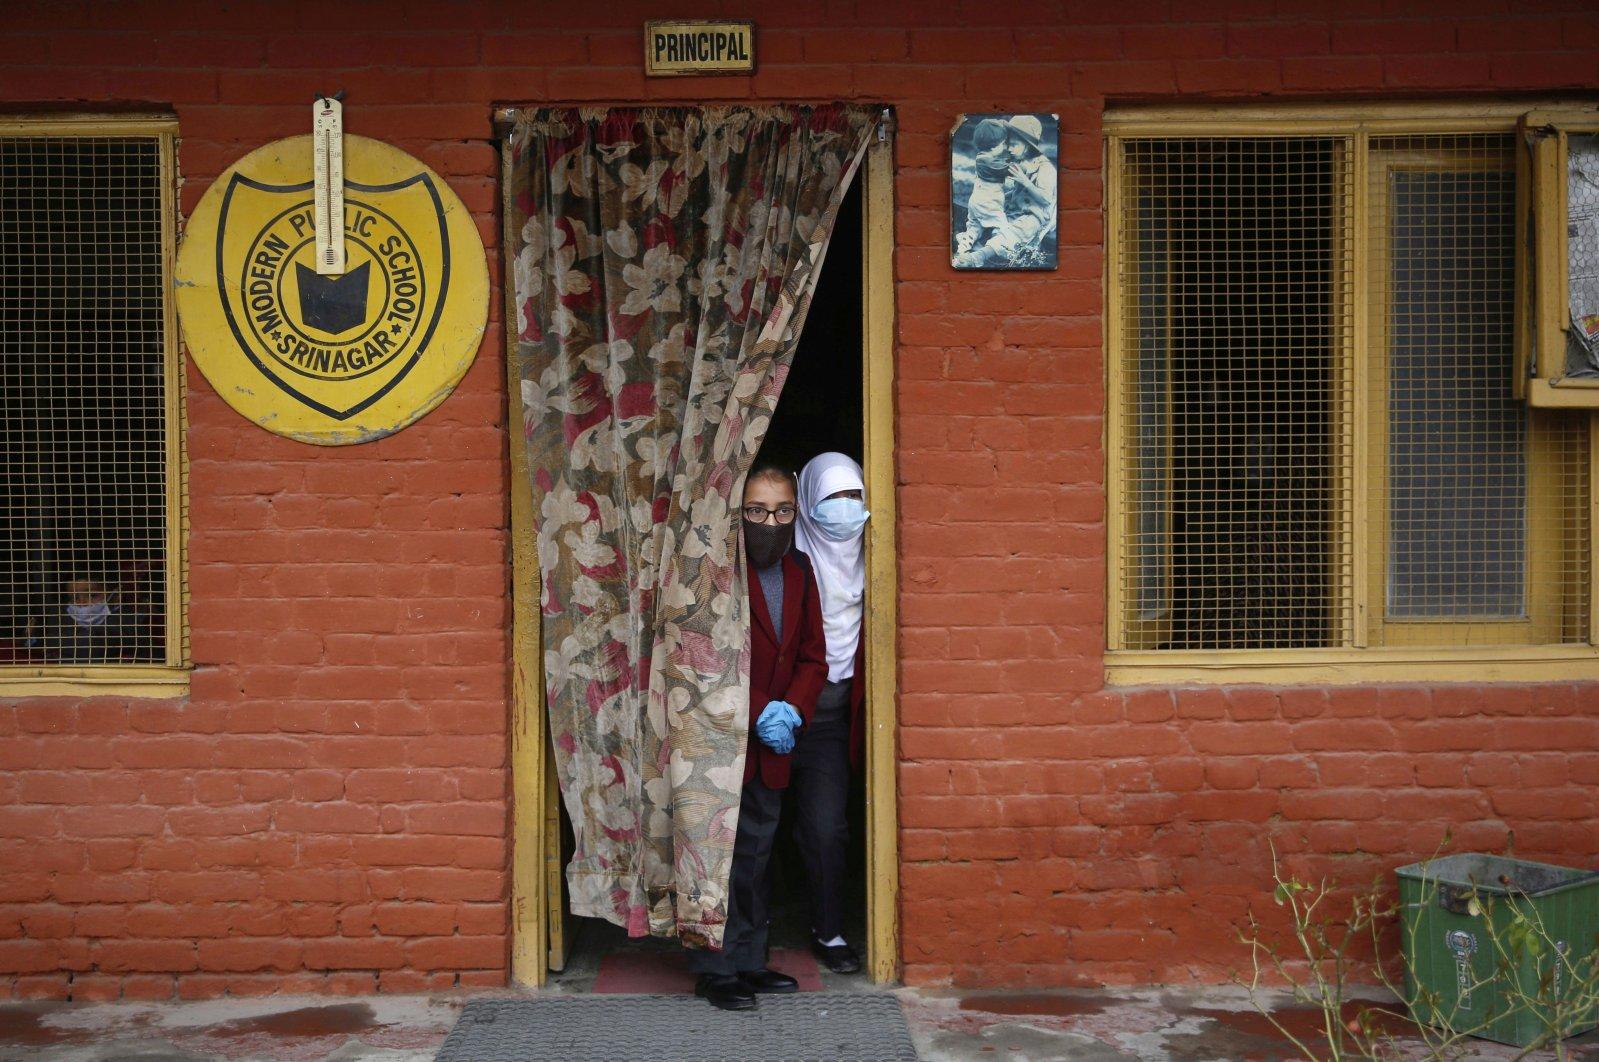 Students peer through a door as they attend school, in Srinagar, Indian Kashmir, March 15, 2021. (EPA)